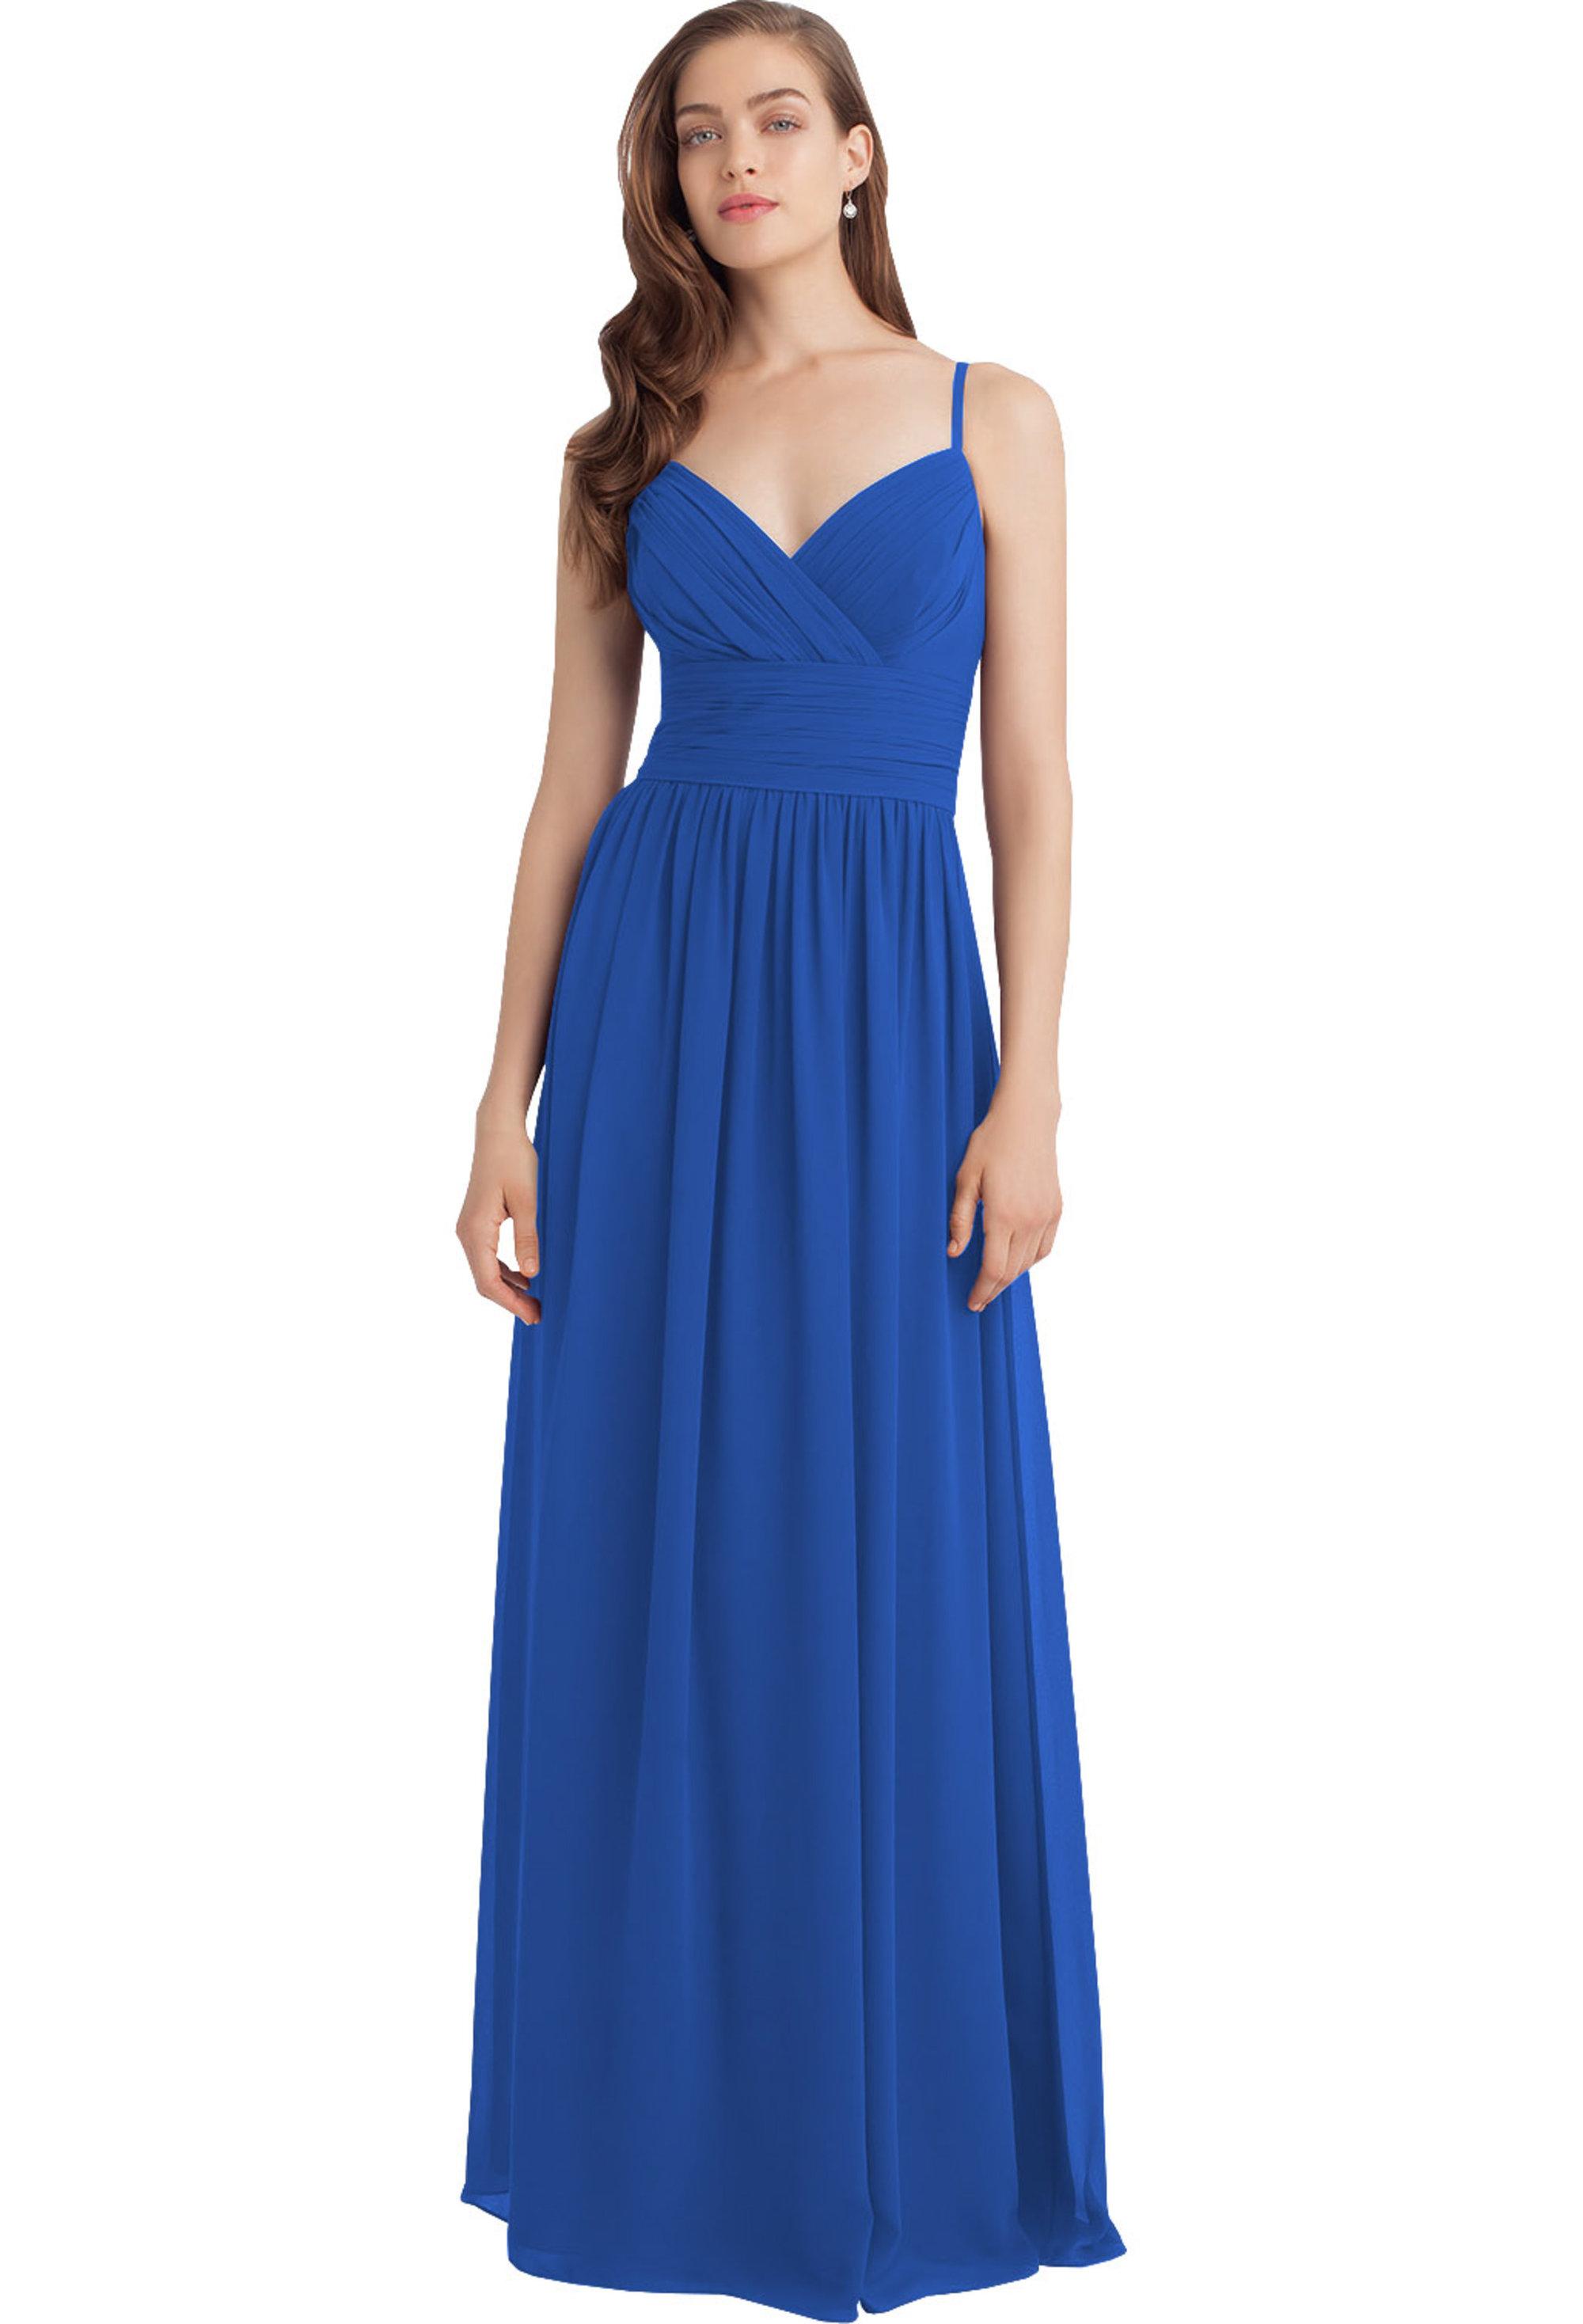 Bill Levkoff HORIZON Chiffon Sweetheart A-line gown, $216.00 Front